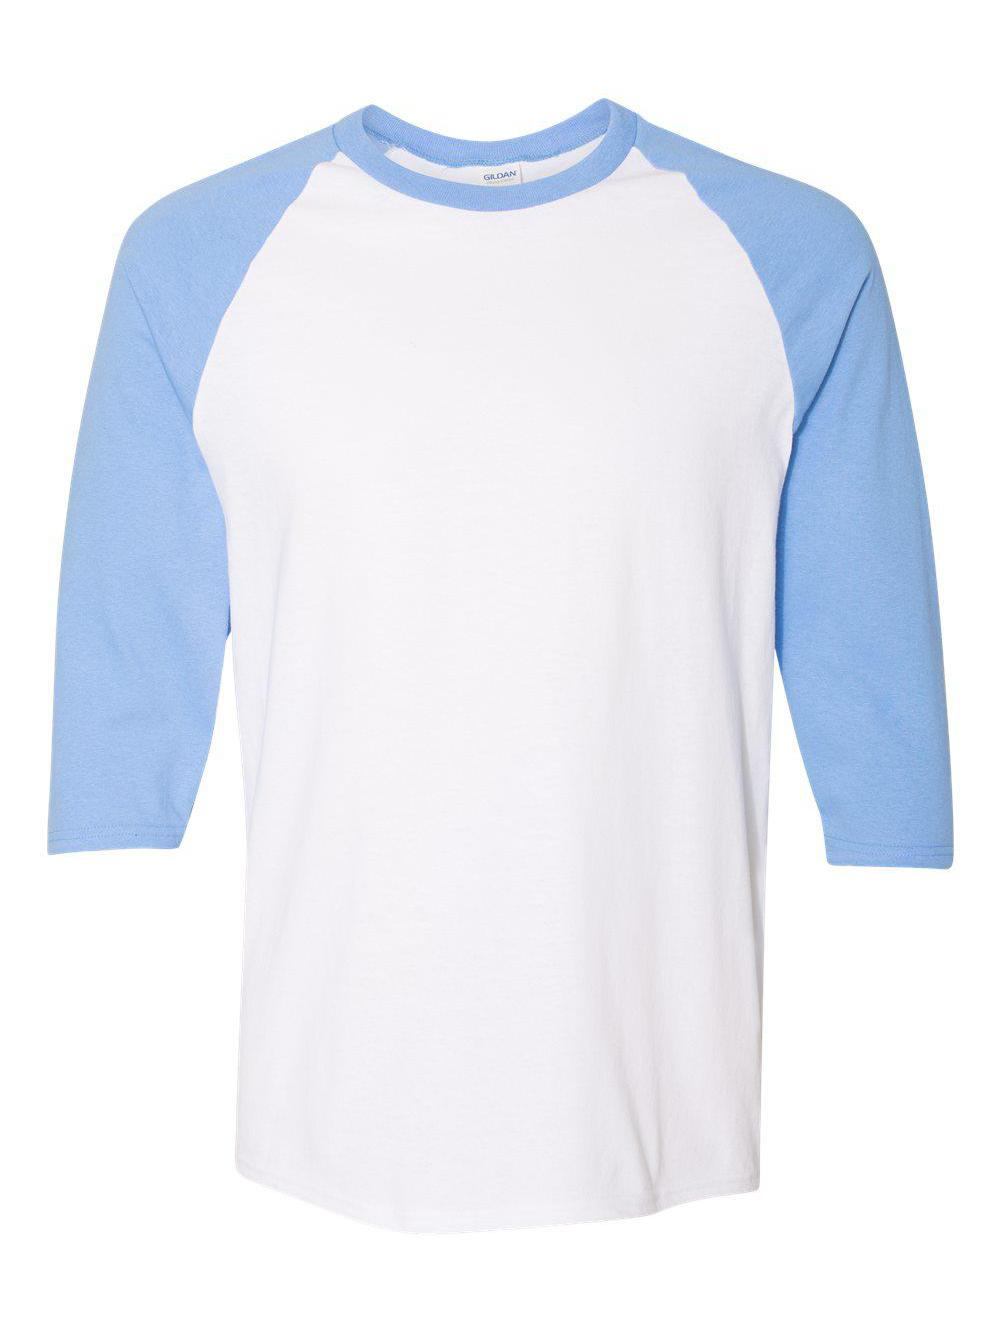 Gildan-Heavy-Cotton-Three-Quarter-Raglan-Sleeve-Baseball-T-Shirt-5700 thumbnail 21